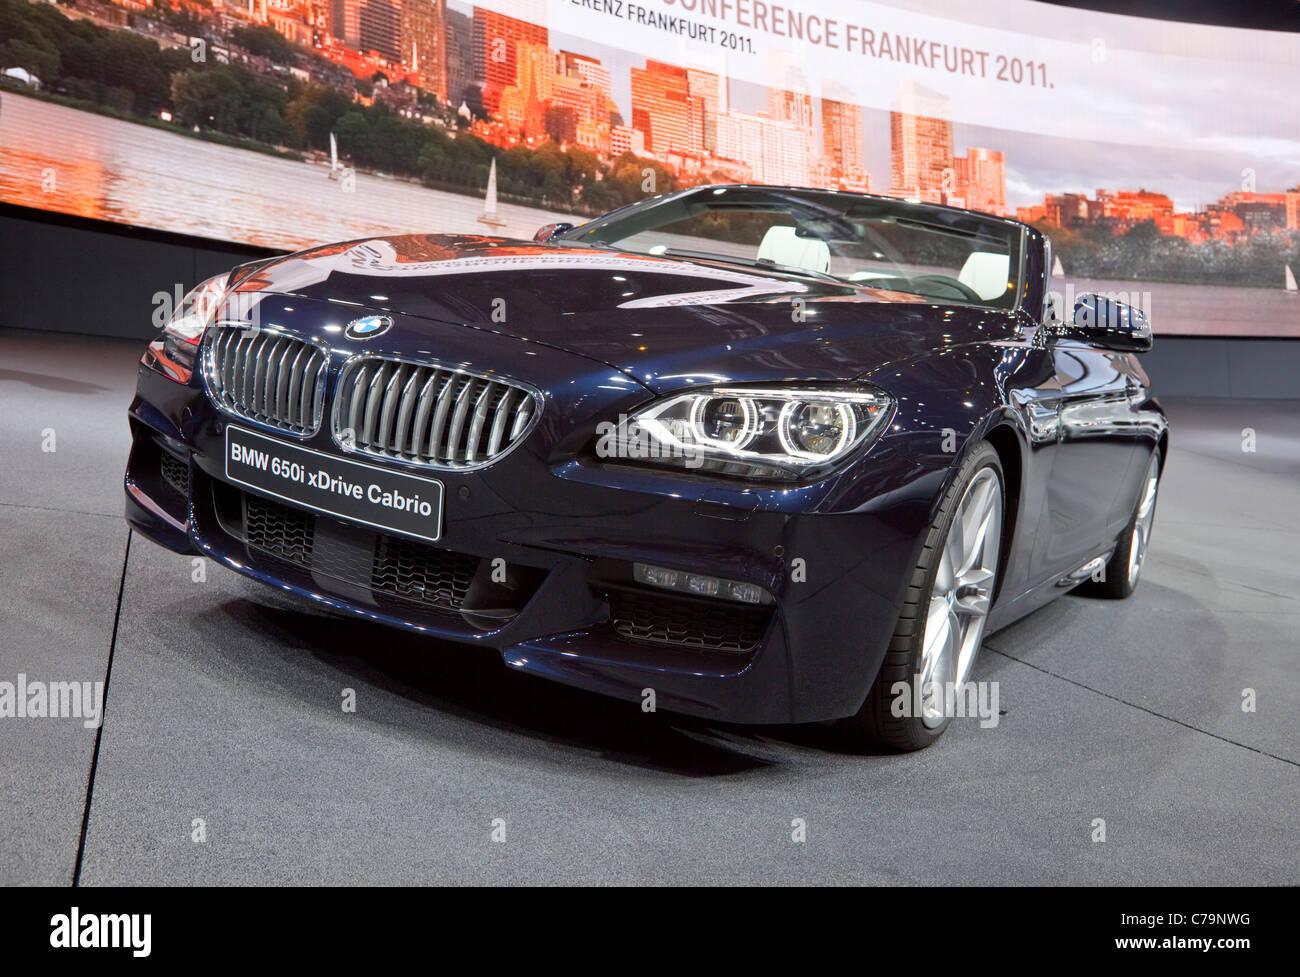 New BMW 650i xDrive Cabrio on the IAA 2011 International Motor Show in Frankfurt am Main, Germany - Stock Image